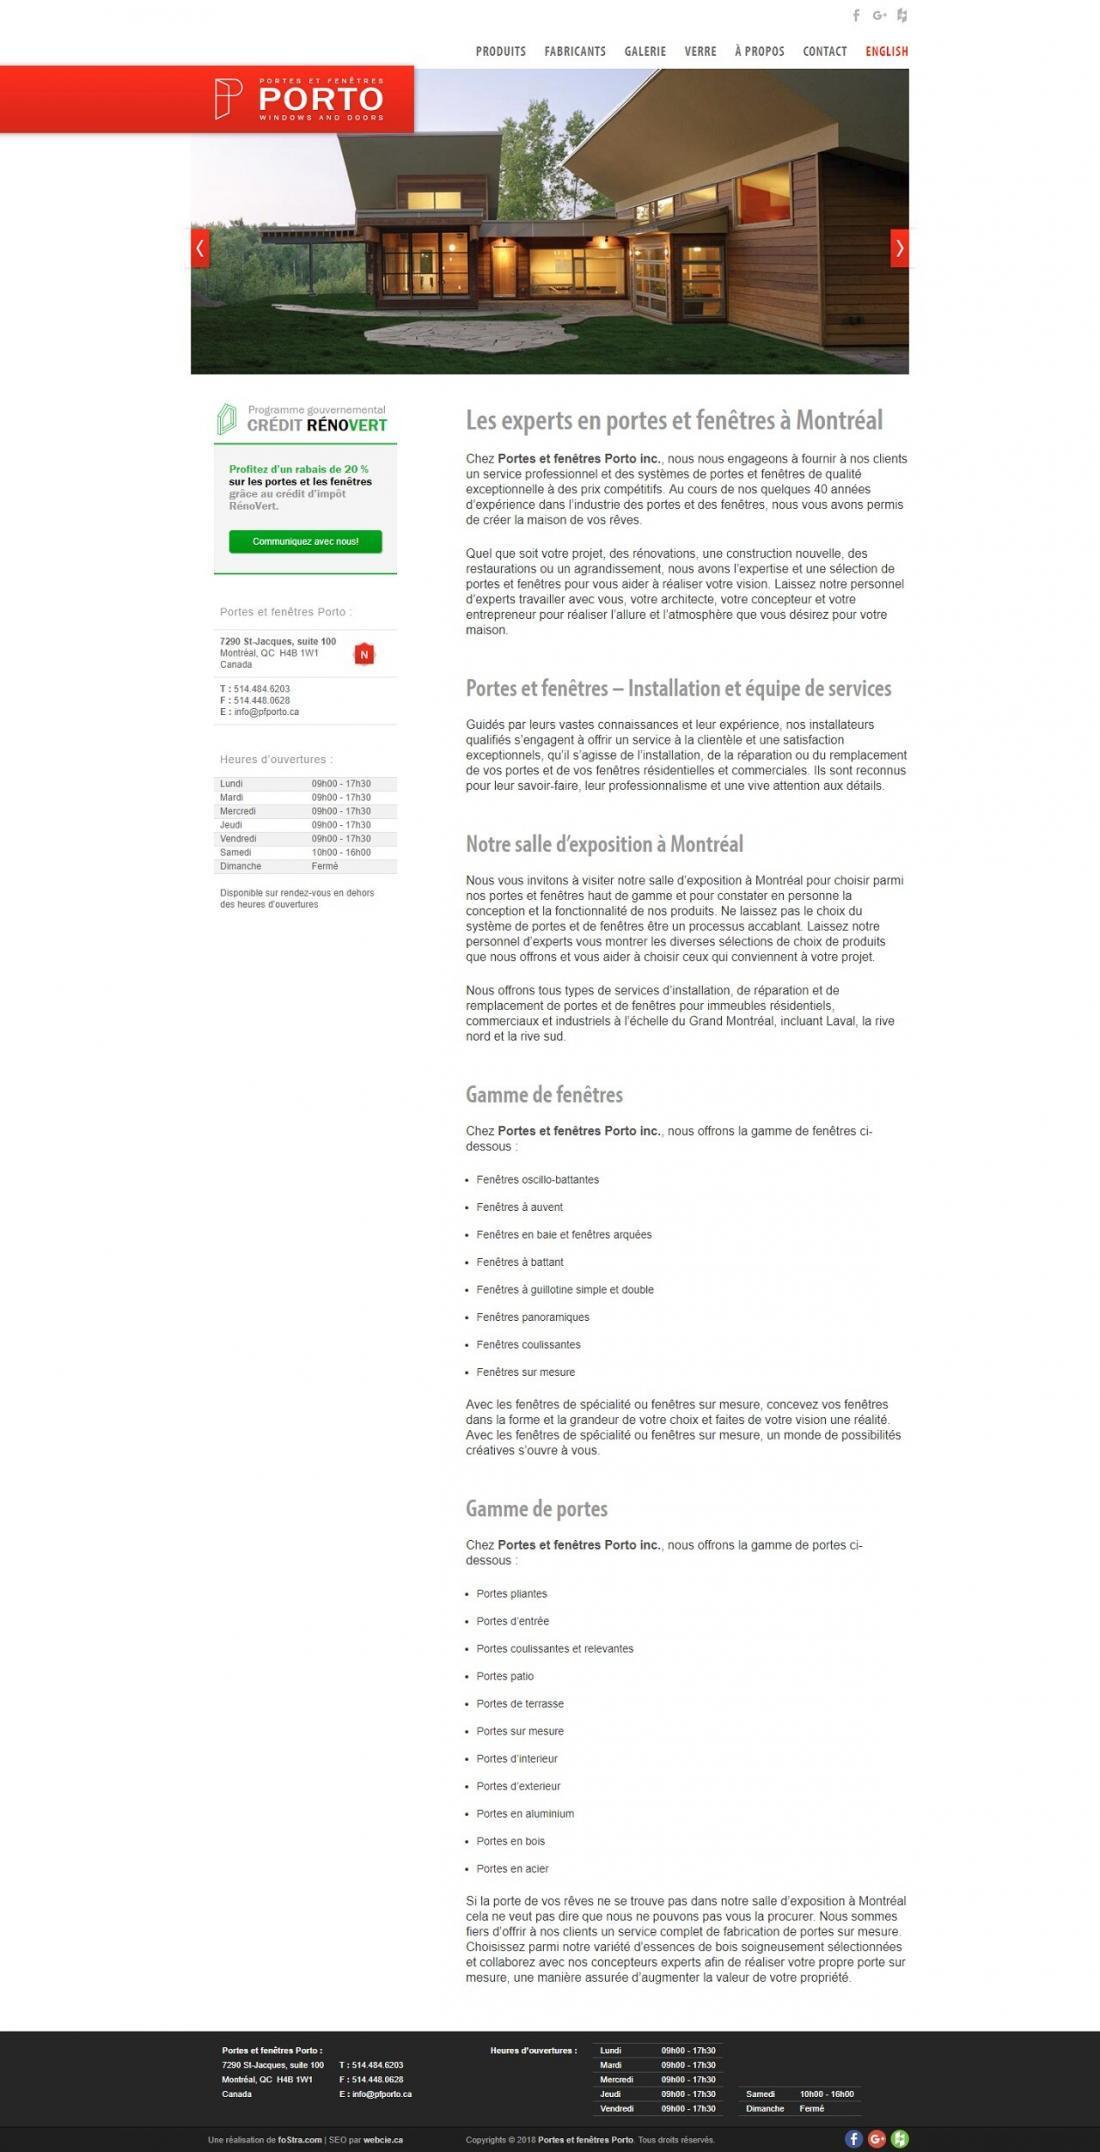 Portes et fenetres Porto, WebCie portfolio, photo